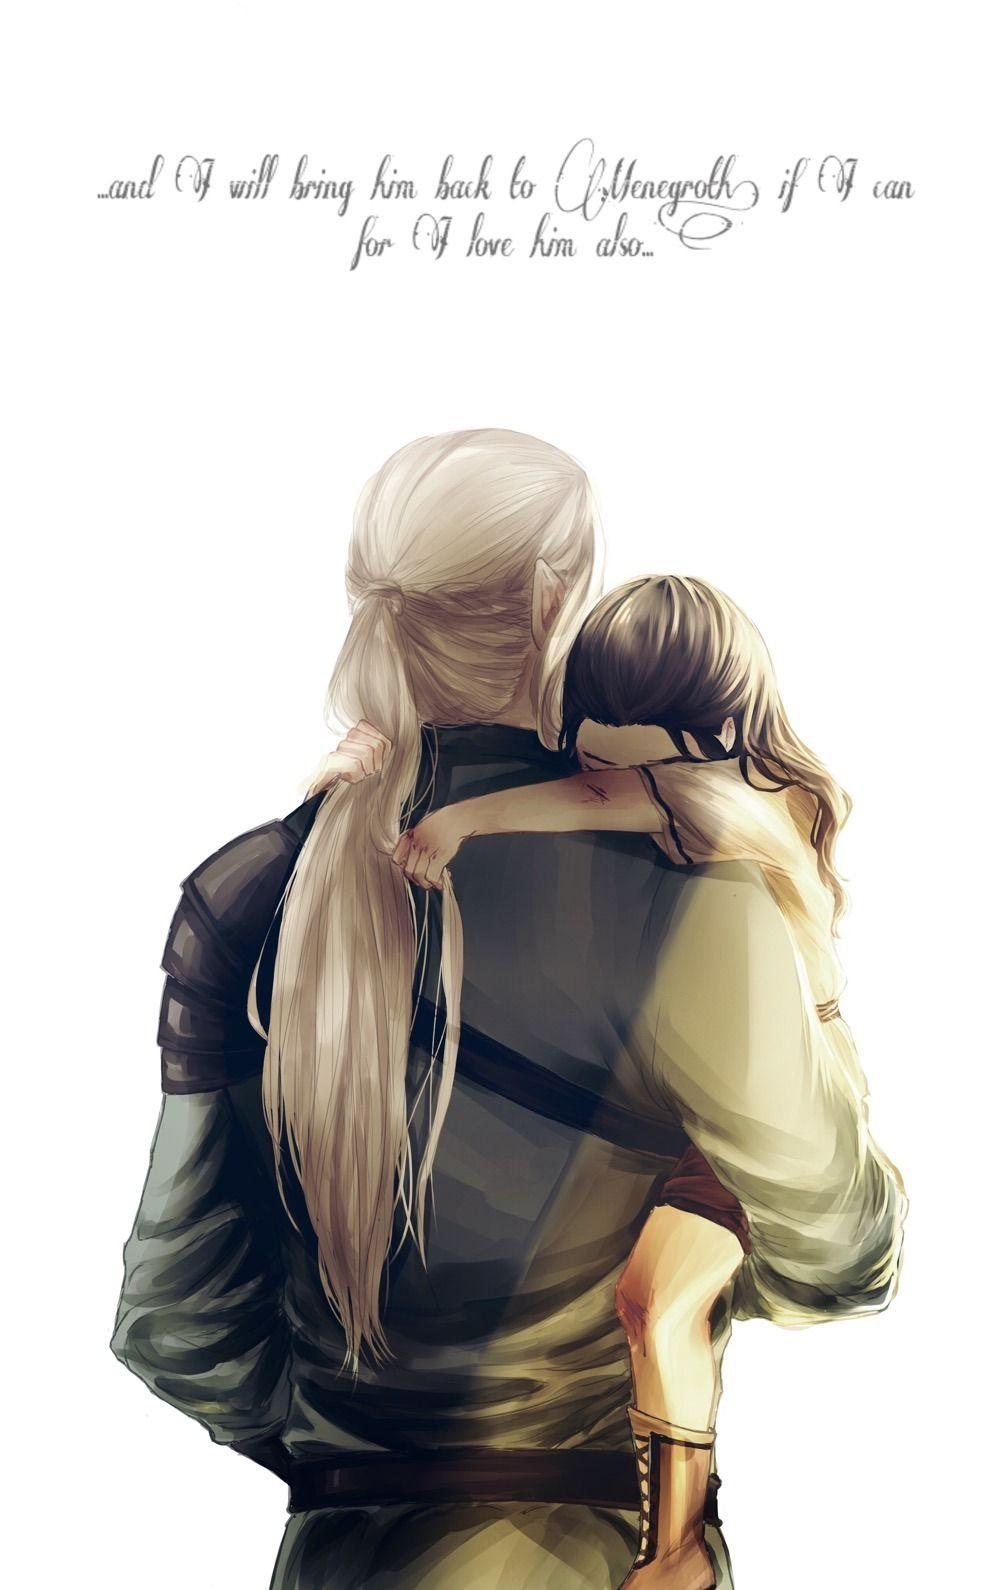 Beleg the elf of Doriath taking care of Túrin the human ...